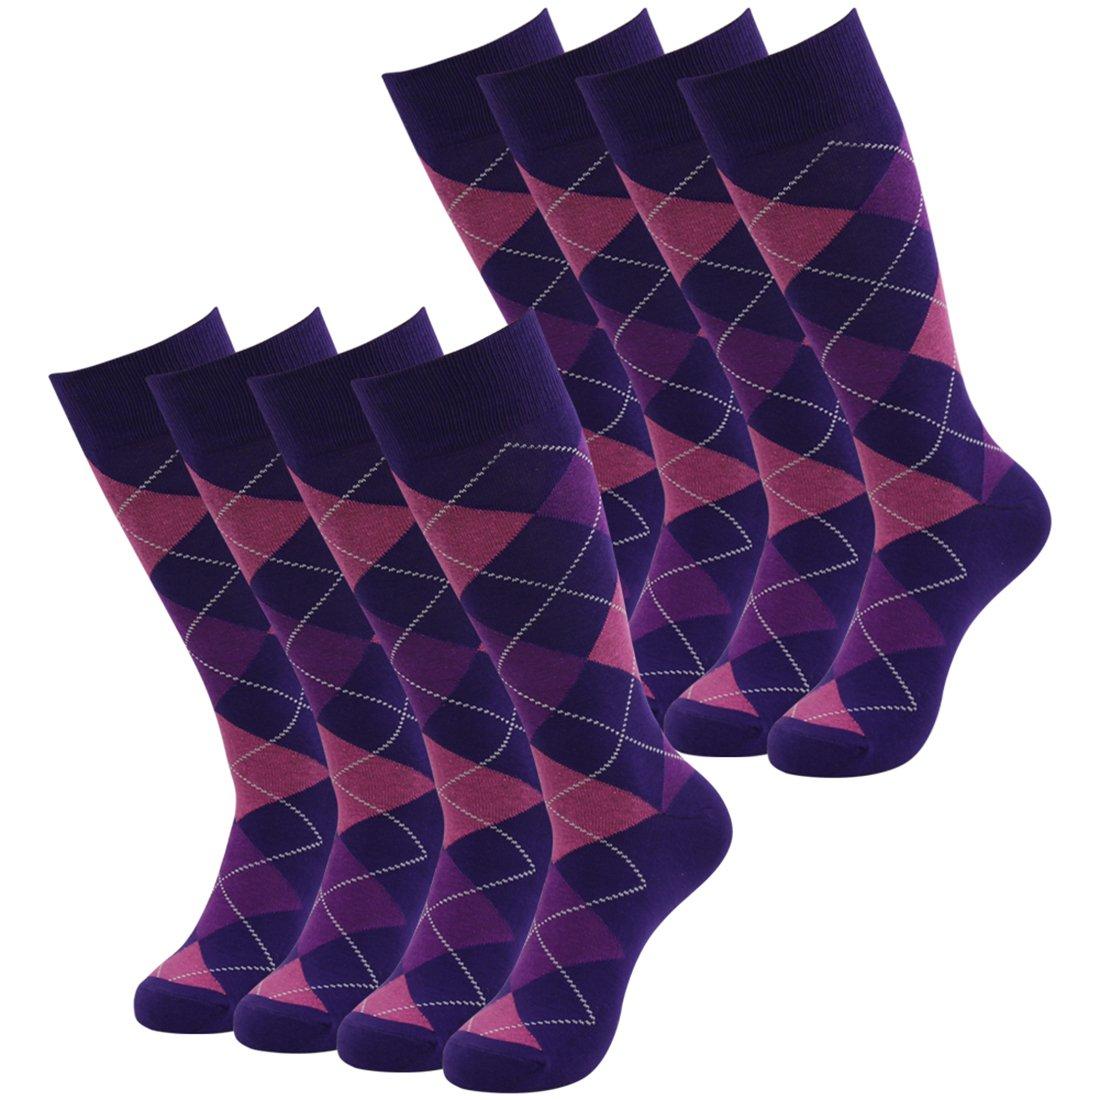 Argyle Dress Socks, SUTTOS Men's Women Custom Elite Casual Fun Purple Argyle Dress Socks Mid Calf Casual Novelty Socks Wedding Groomsmen Socks Jacquard Plaid Cotton Knit Back to School Socks,8 Pairs